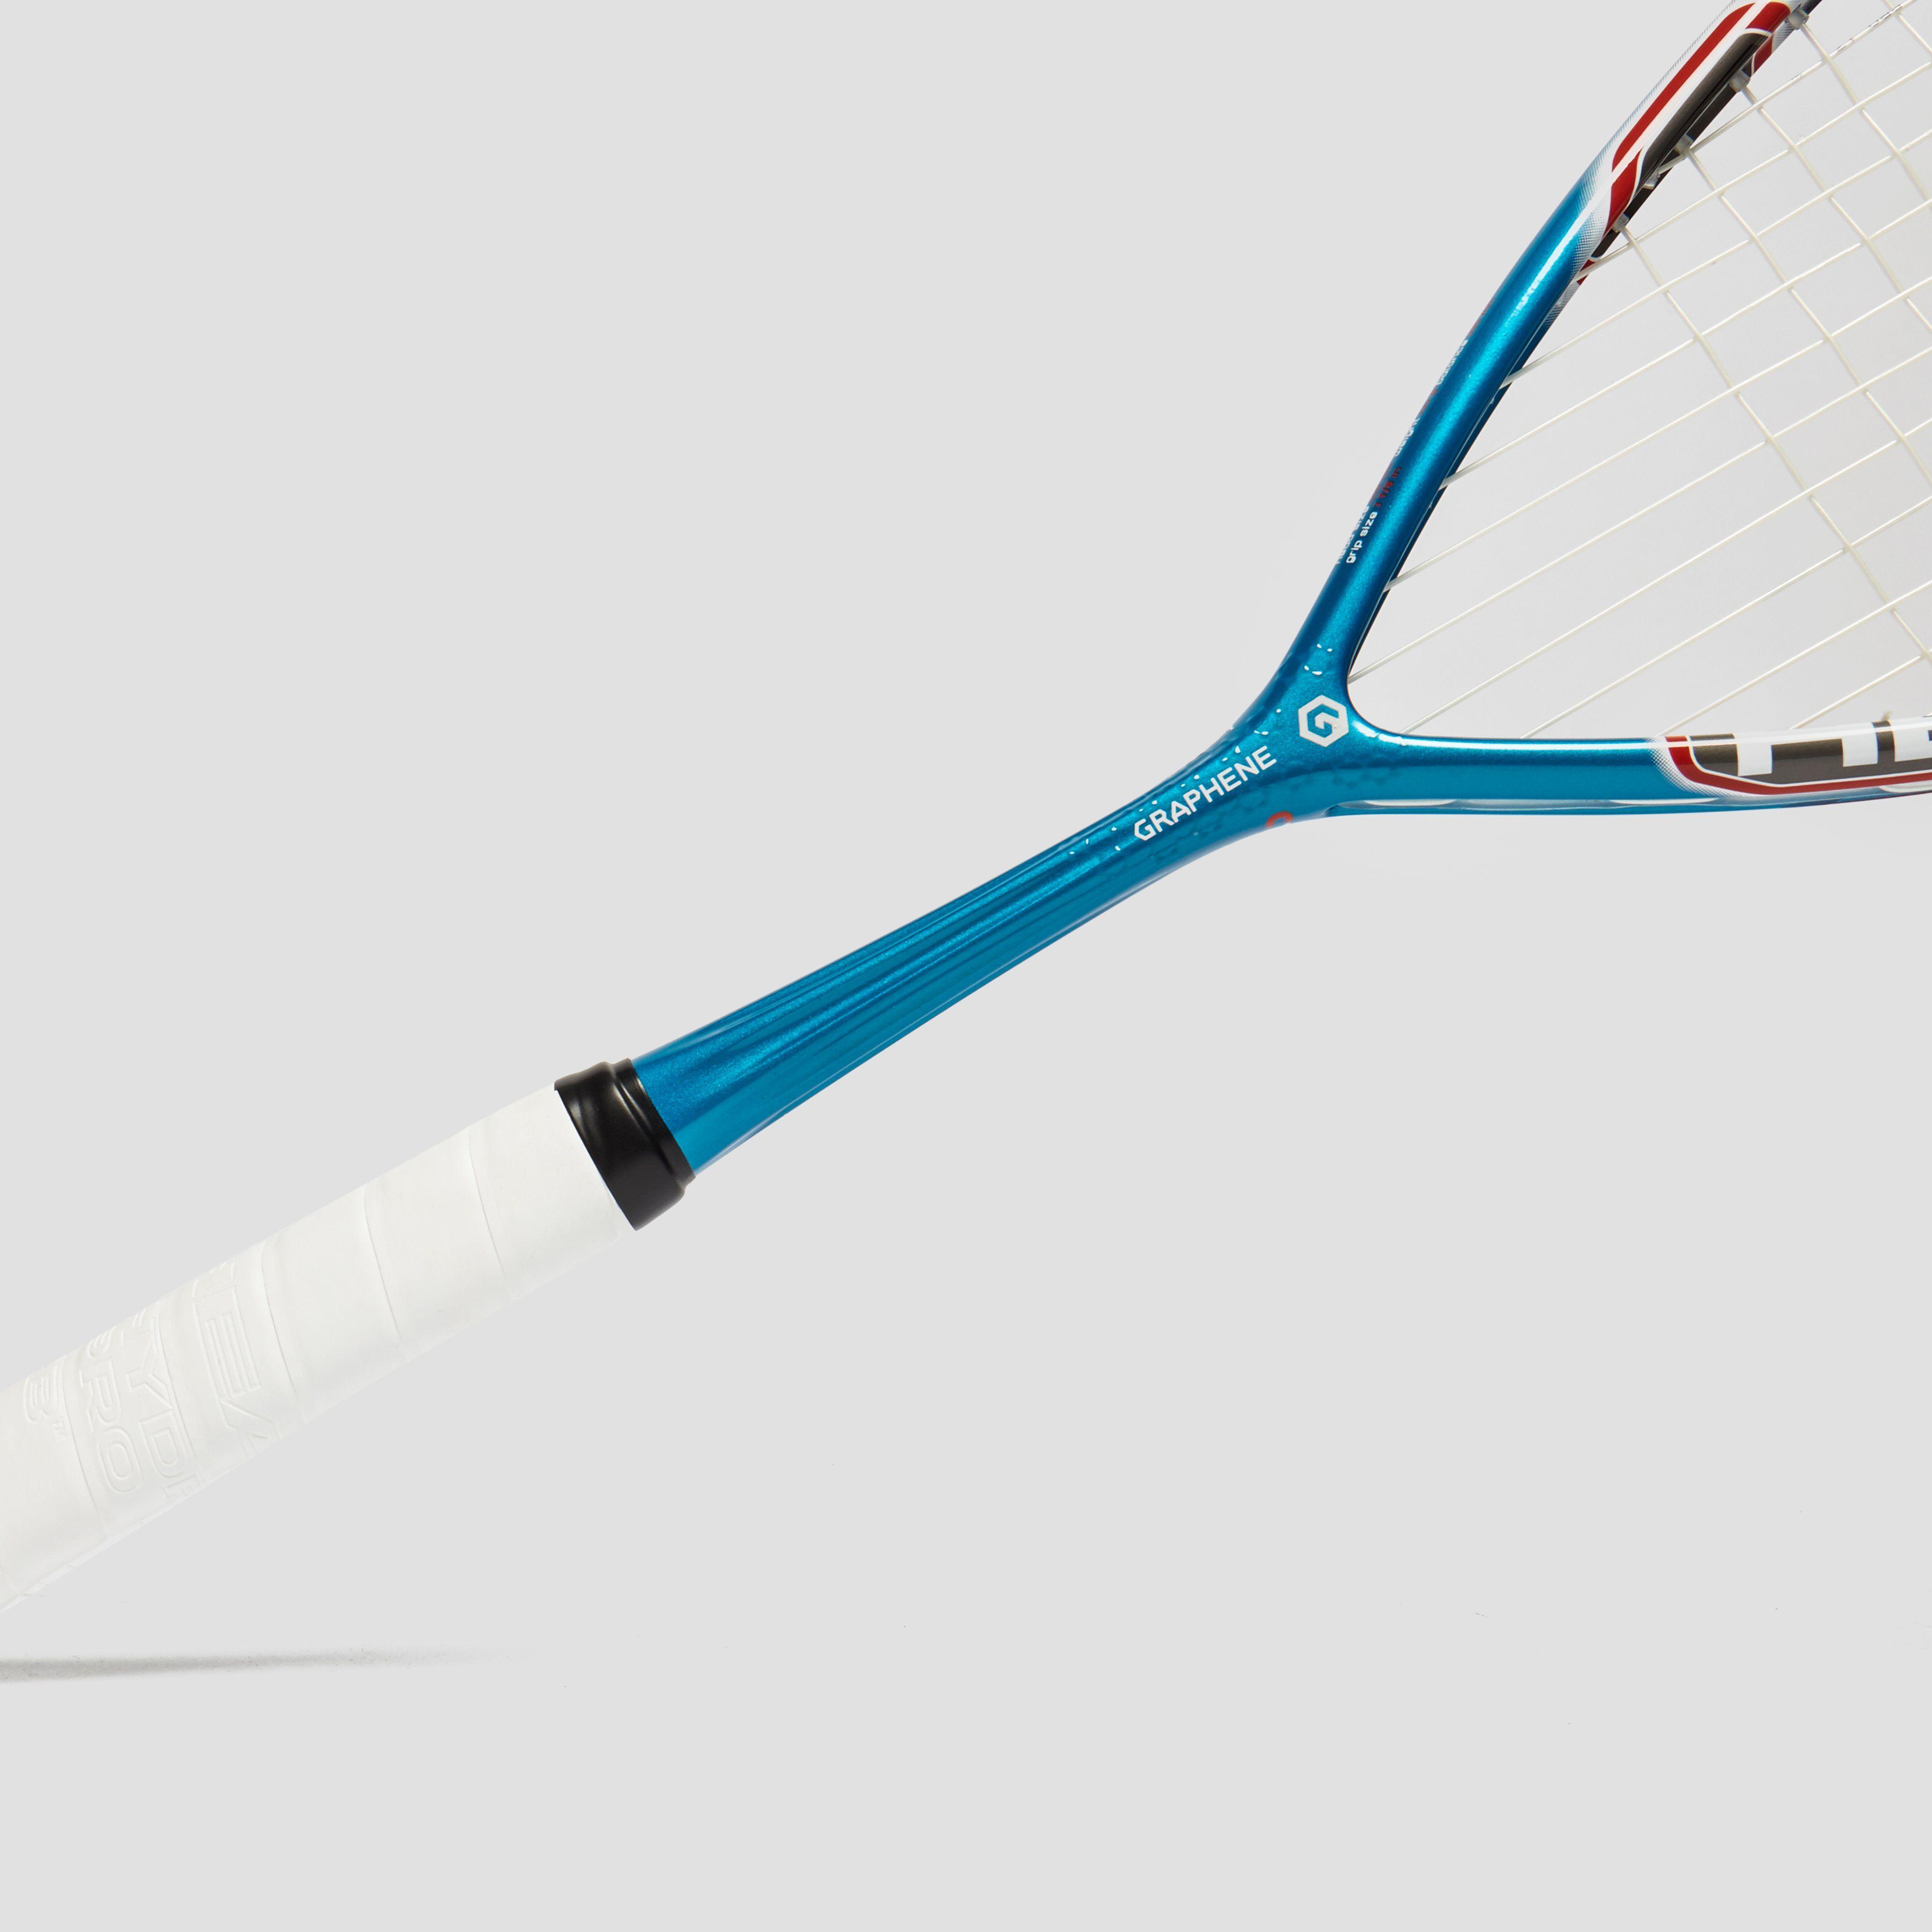 Head Graphene Cyano 135 Squash Racket